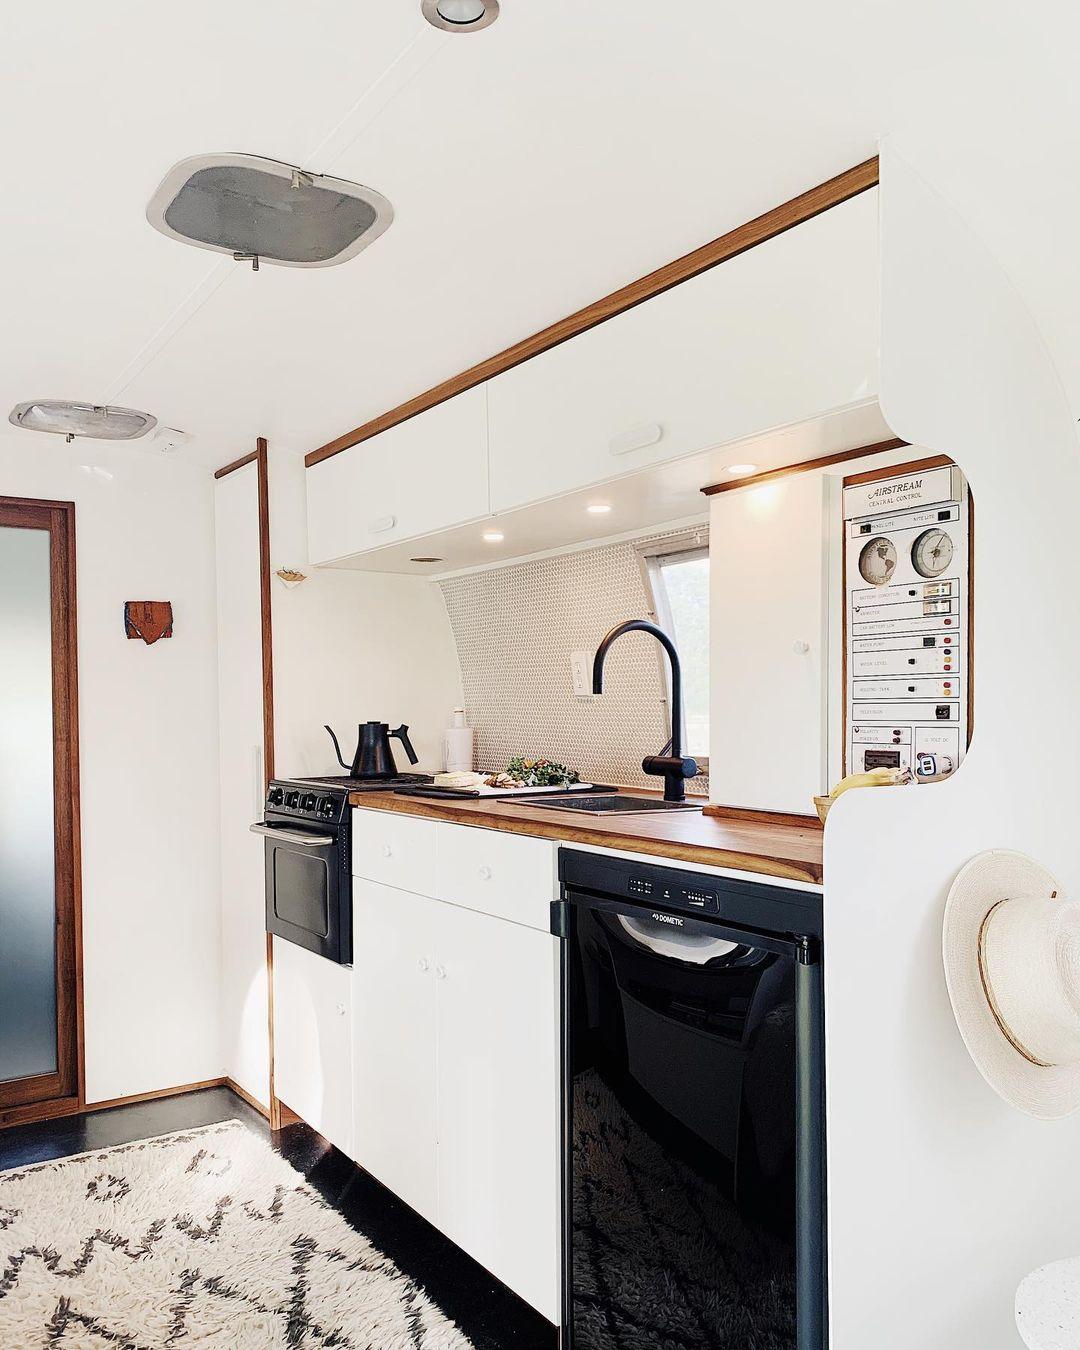 Airstream trailer Haus 14 - Interior designer turned heirloom Airstream into delightful home